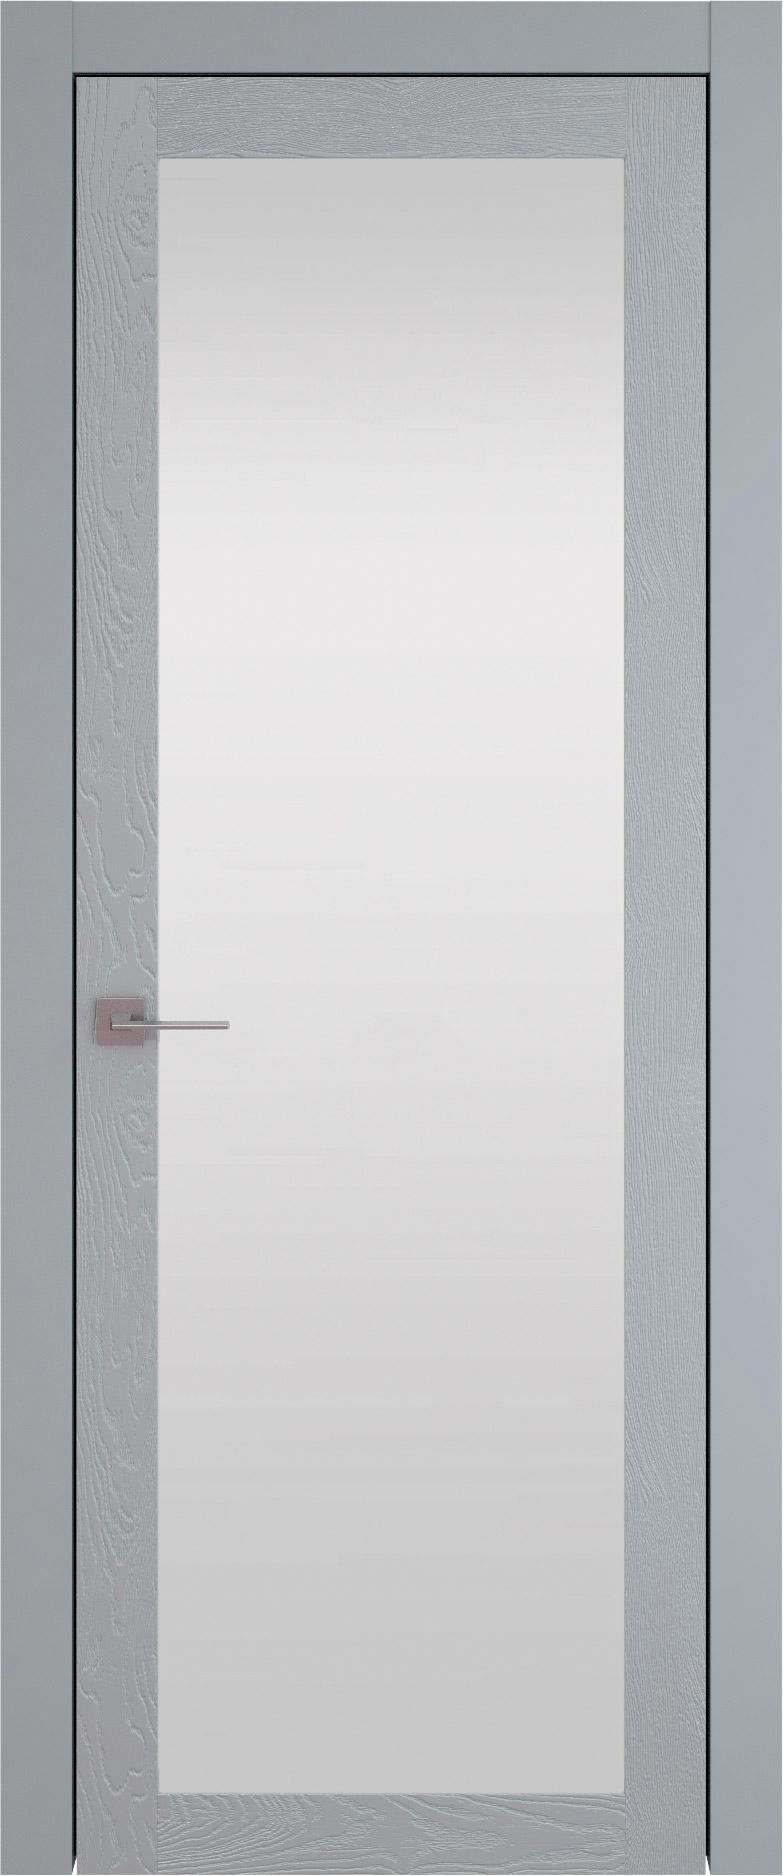 Tivoli З-1 цвет - Серебристо-серая эмаль по шпону (RAL 7045) Со стеклом (ДО)